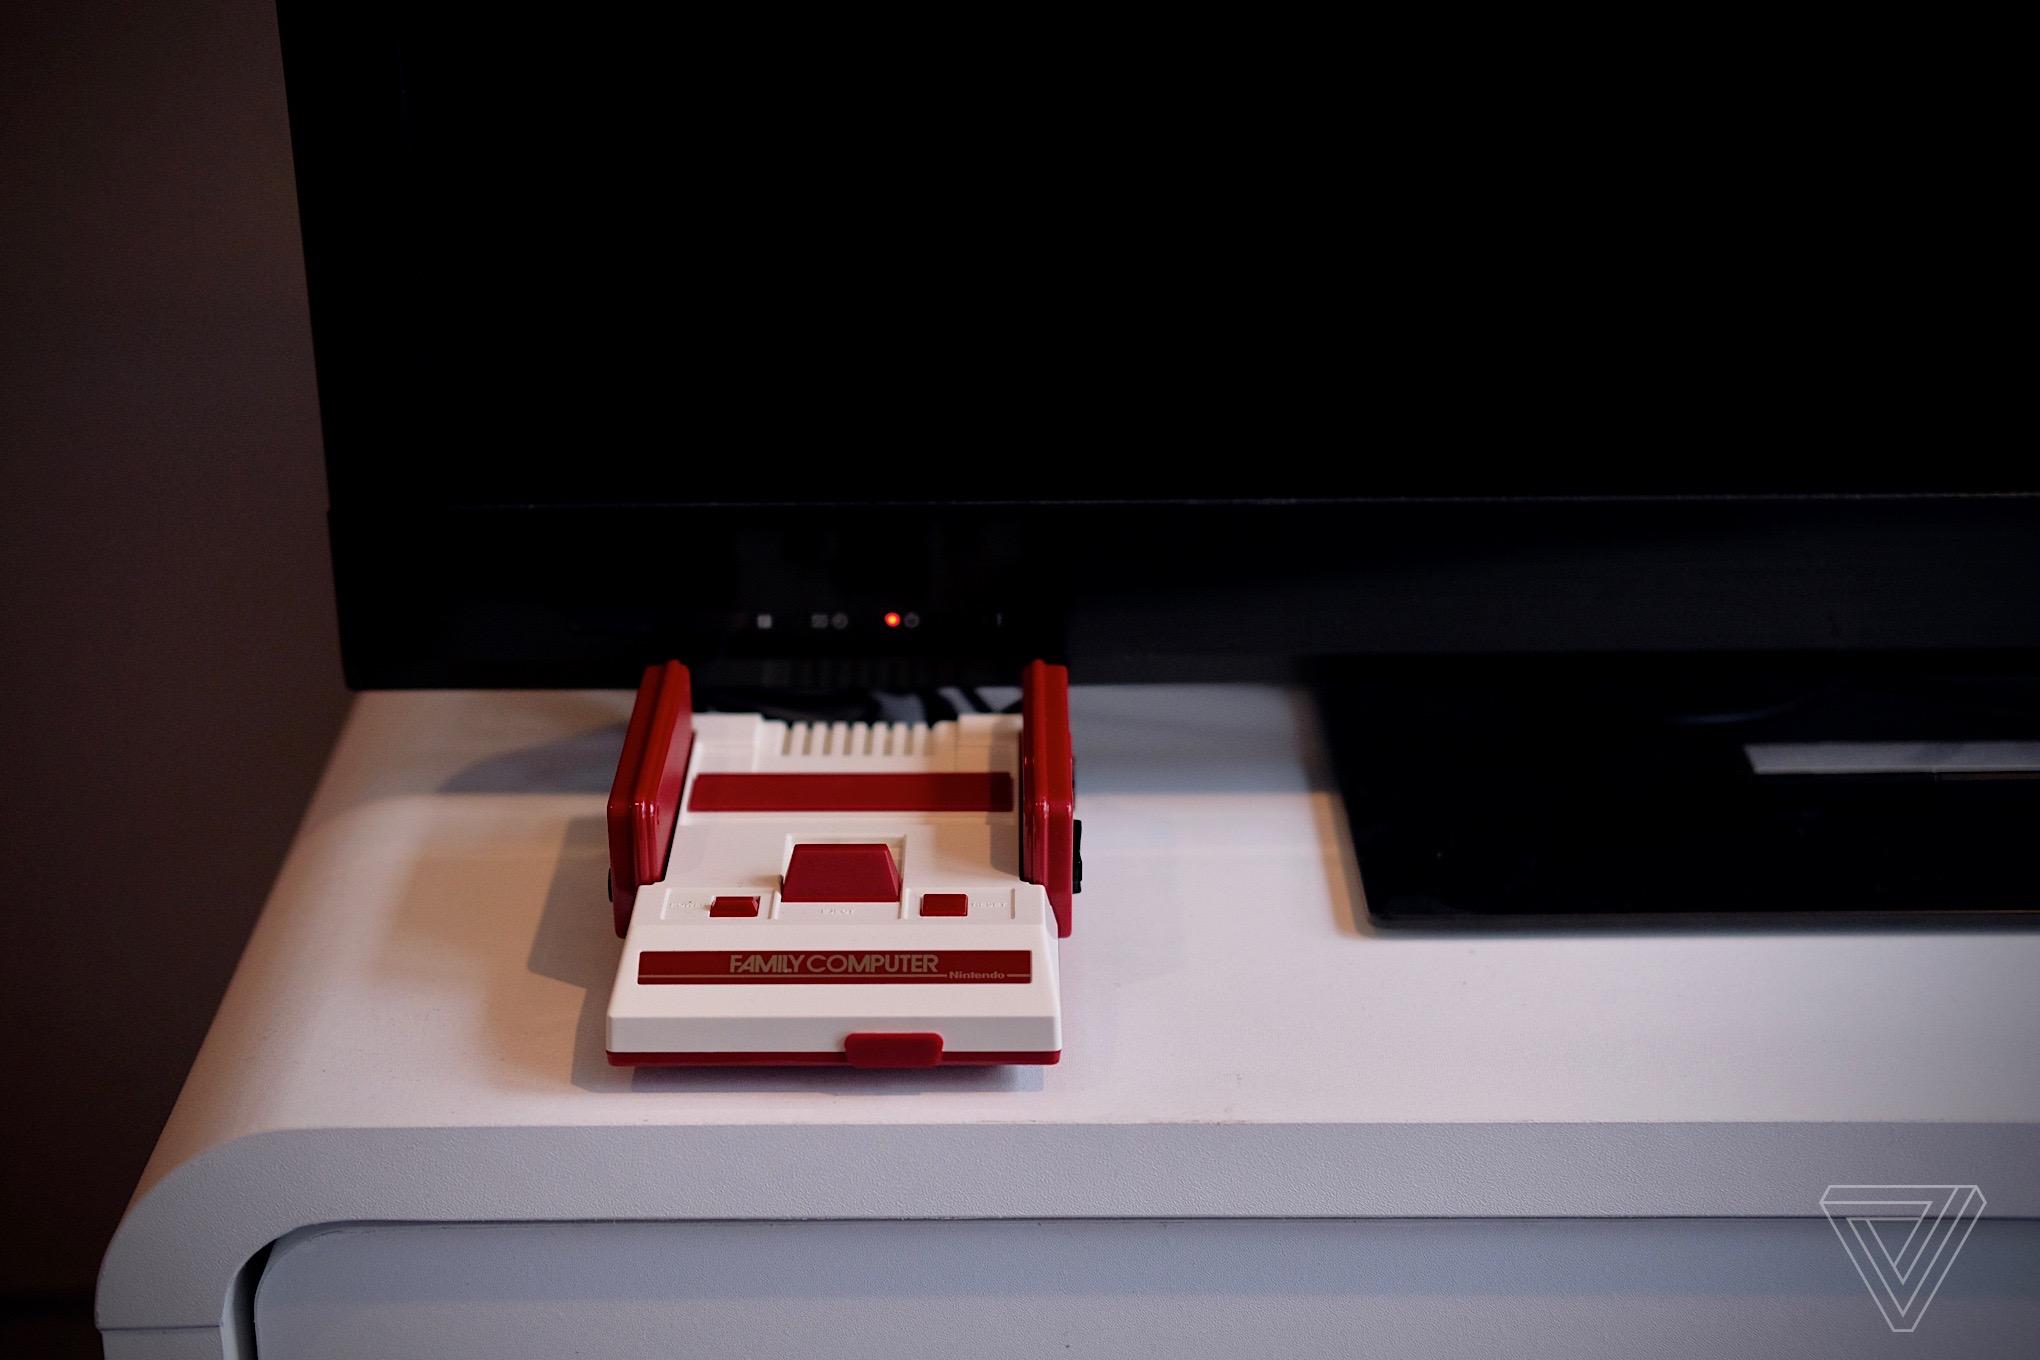 Nintendo Classic Mini Famicom photos